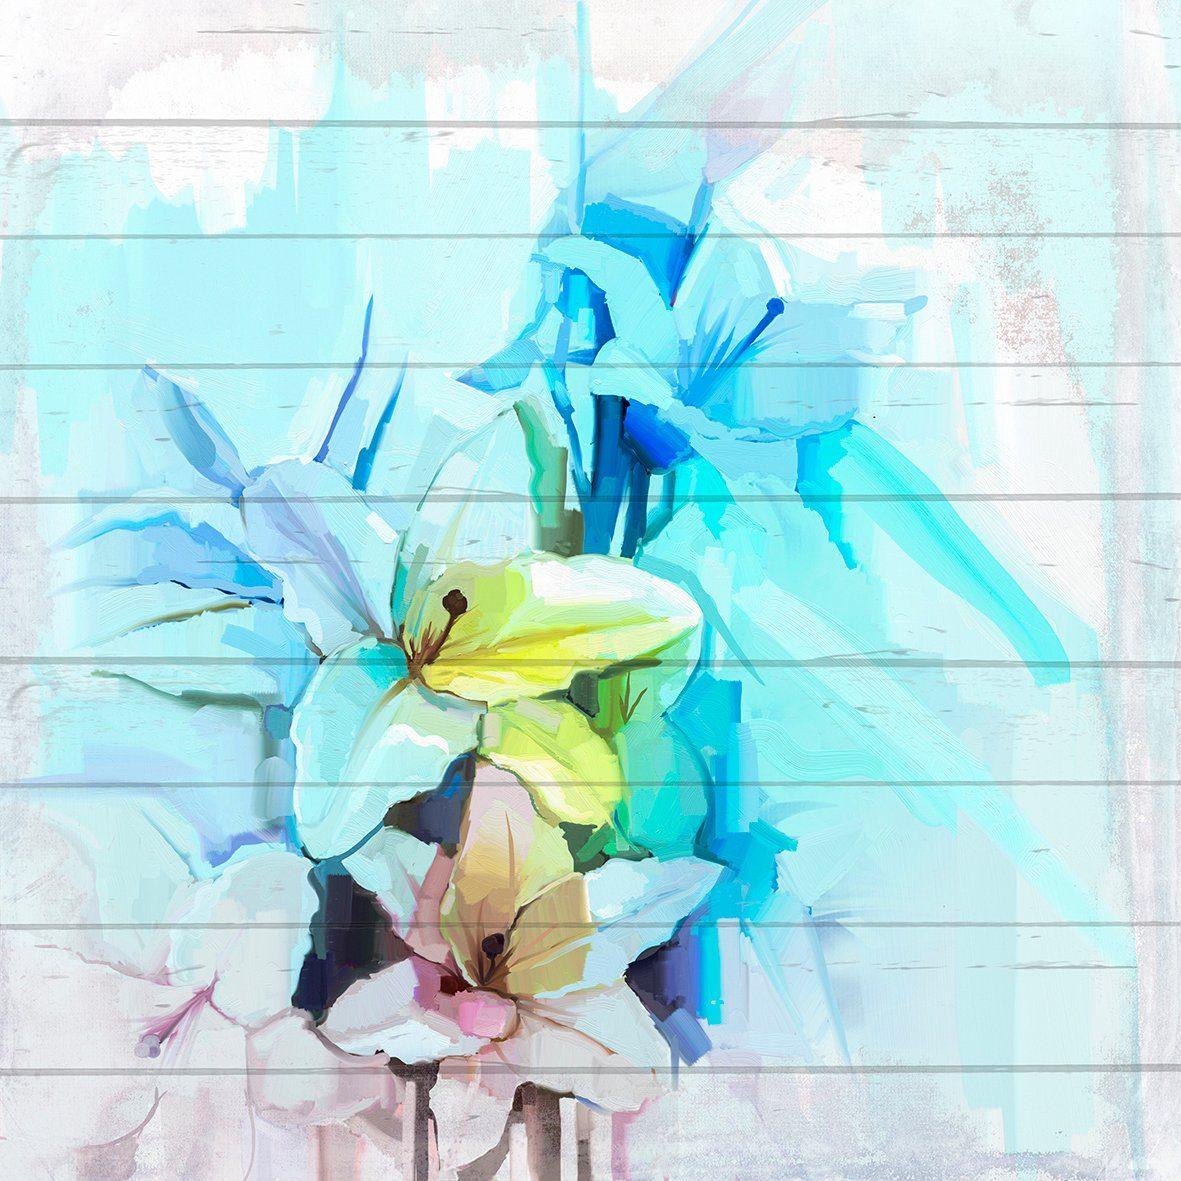 QUEENCE Holzbild »Blau-Weiße Blüten«, 40x40 cm Echtholz